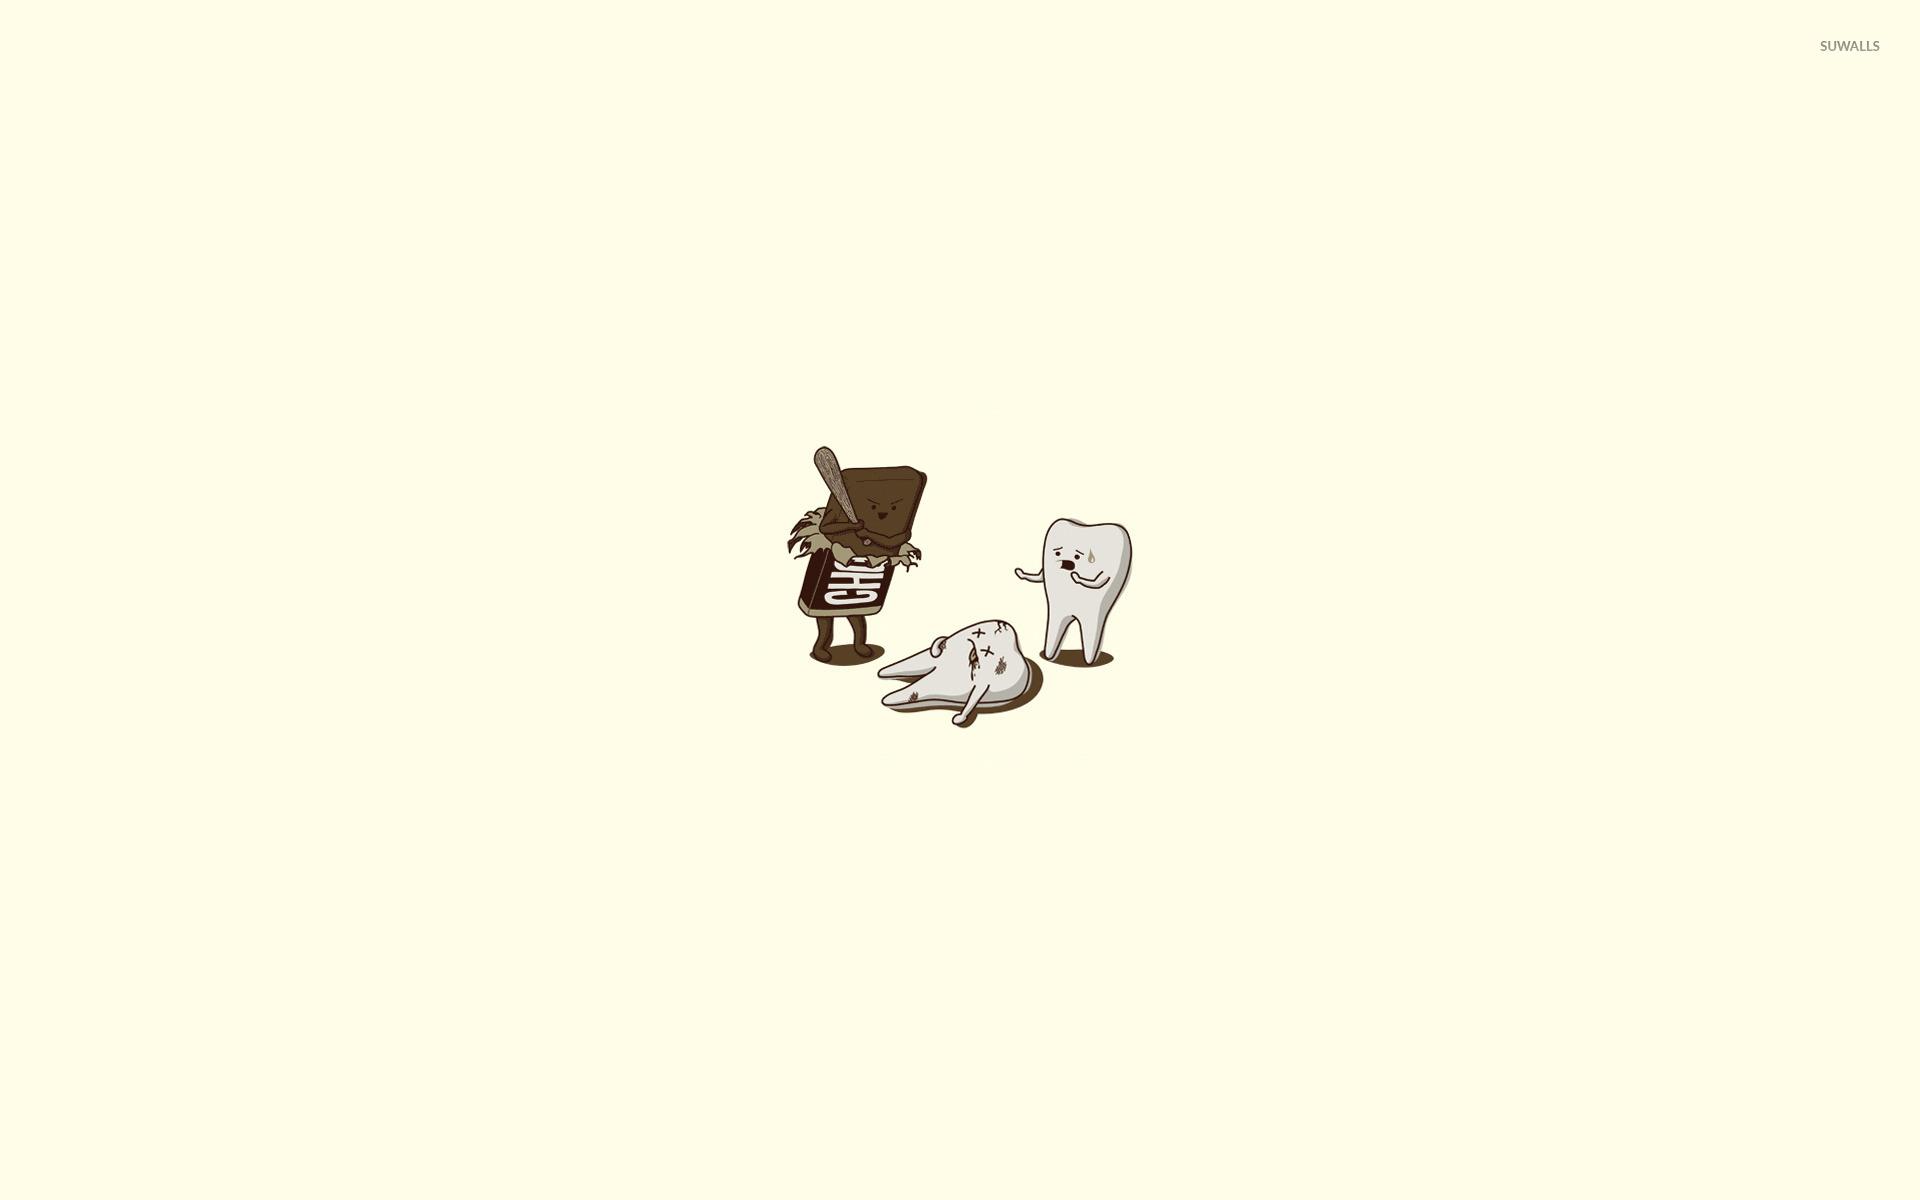 Cow Wallpaper Cute Chocolate Vs Teeth Wallpaper Funny Wallpapers 15223